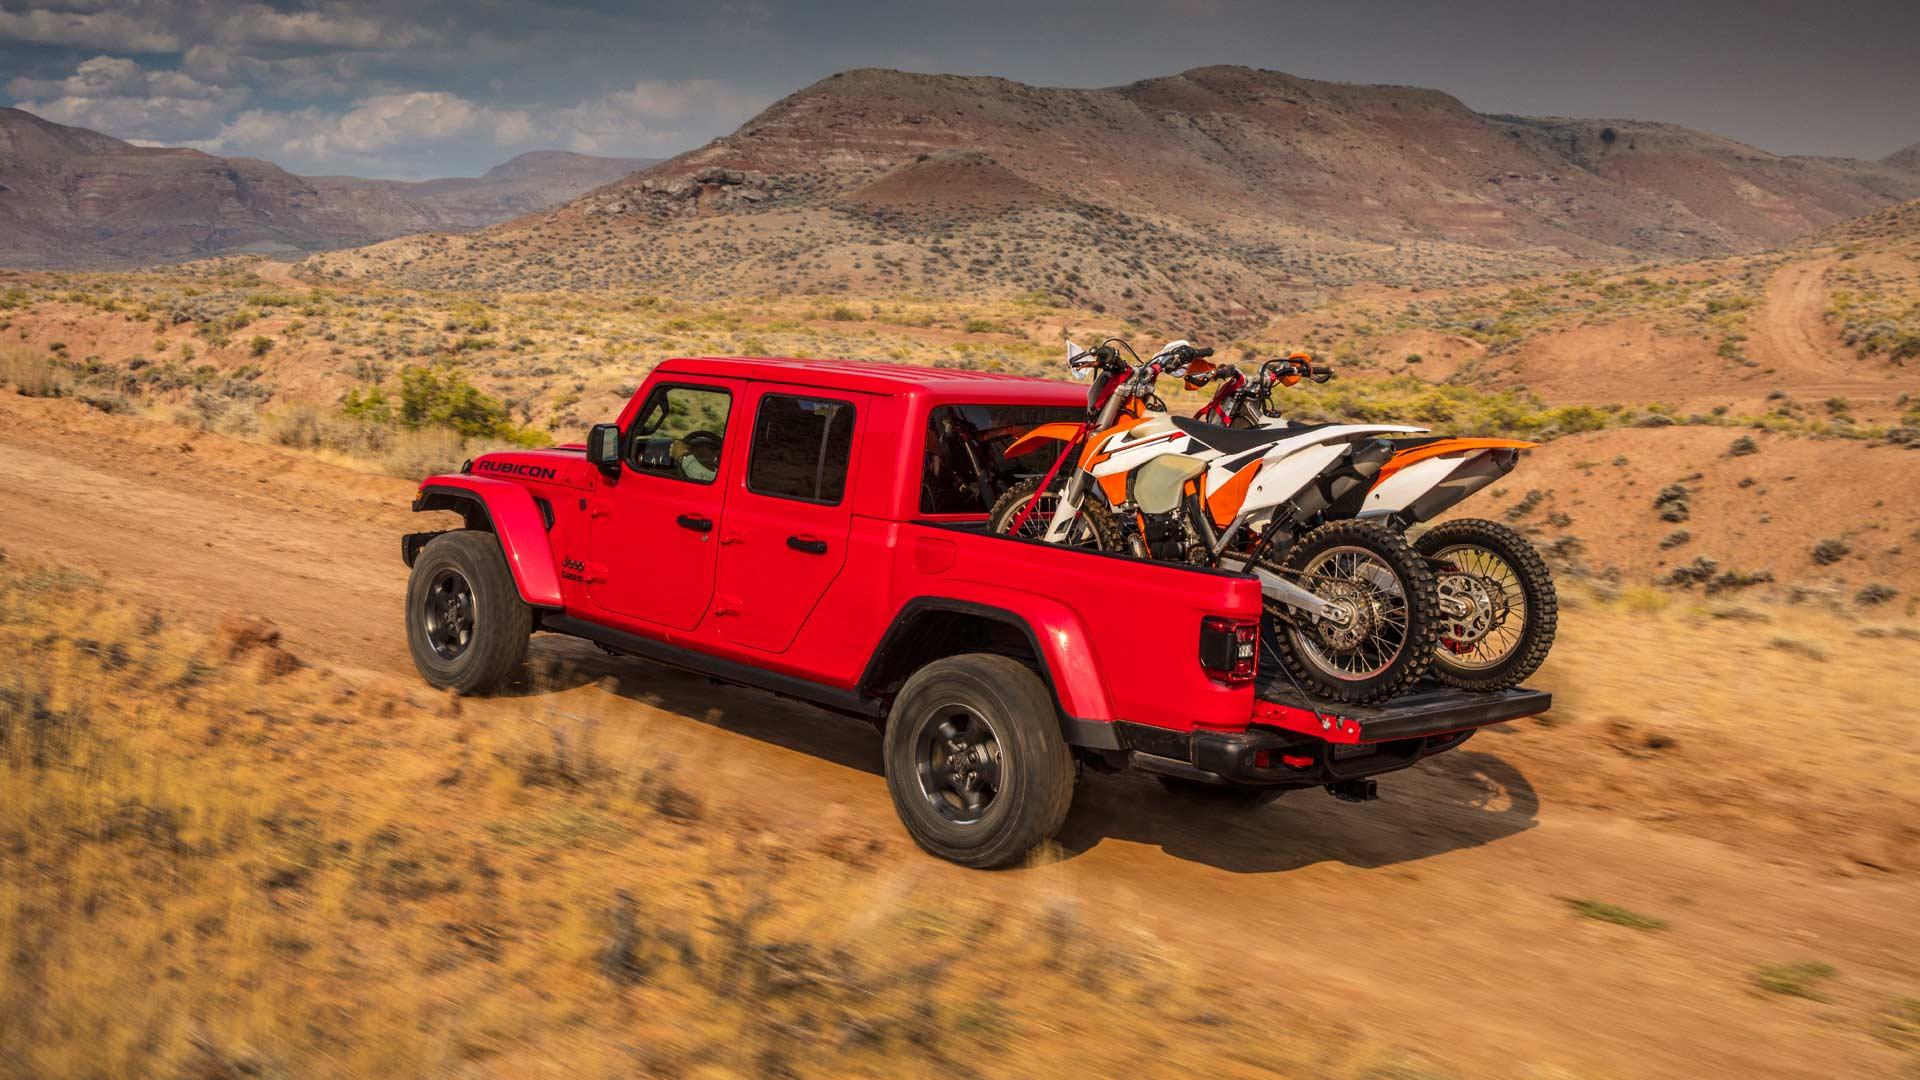 2020-Jeep-Gladiator-Rubicon_6